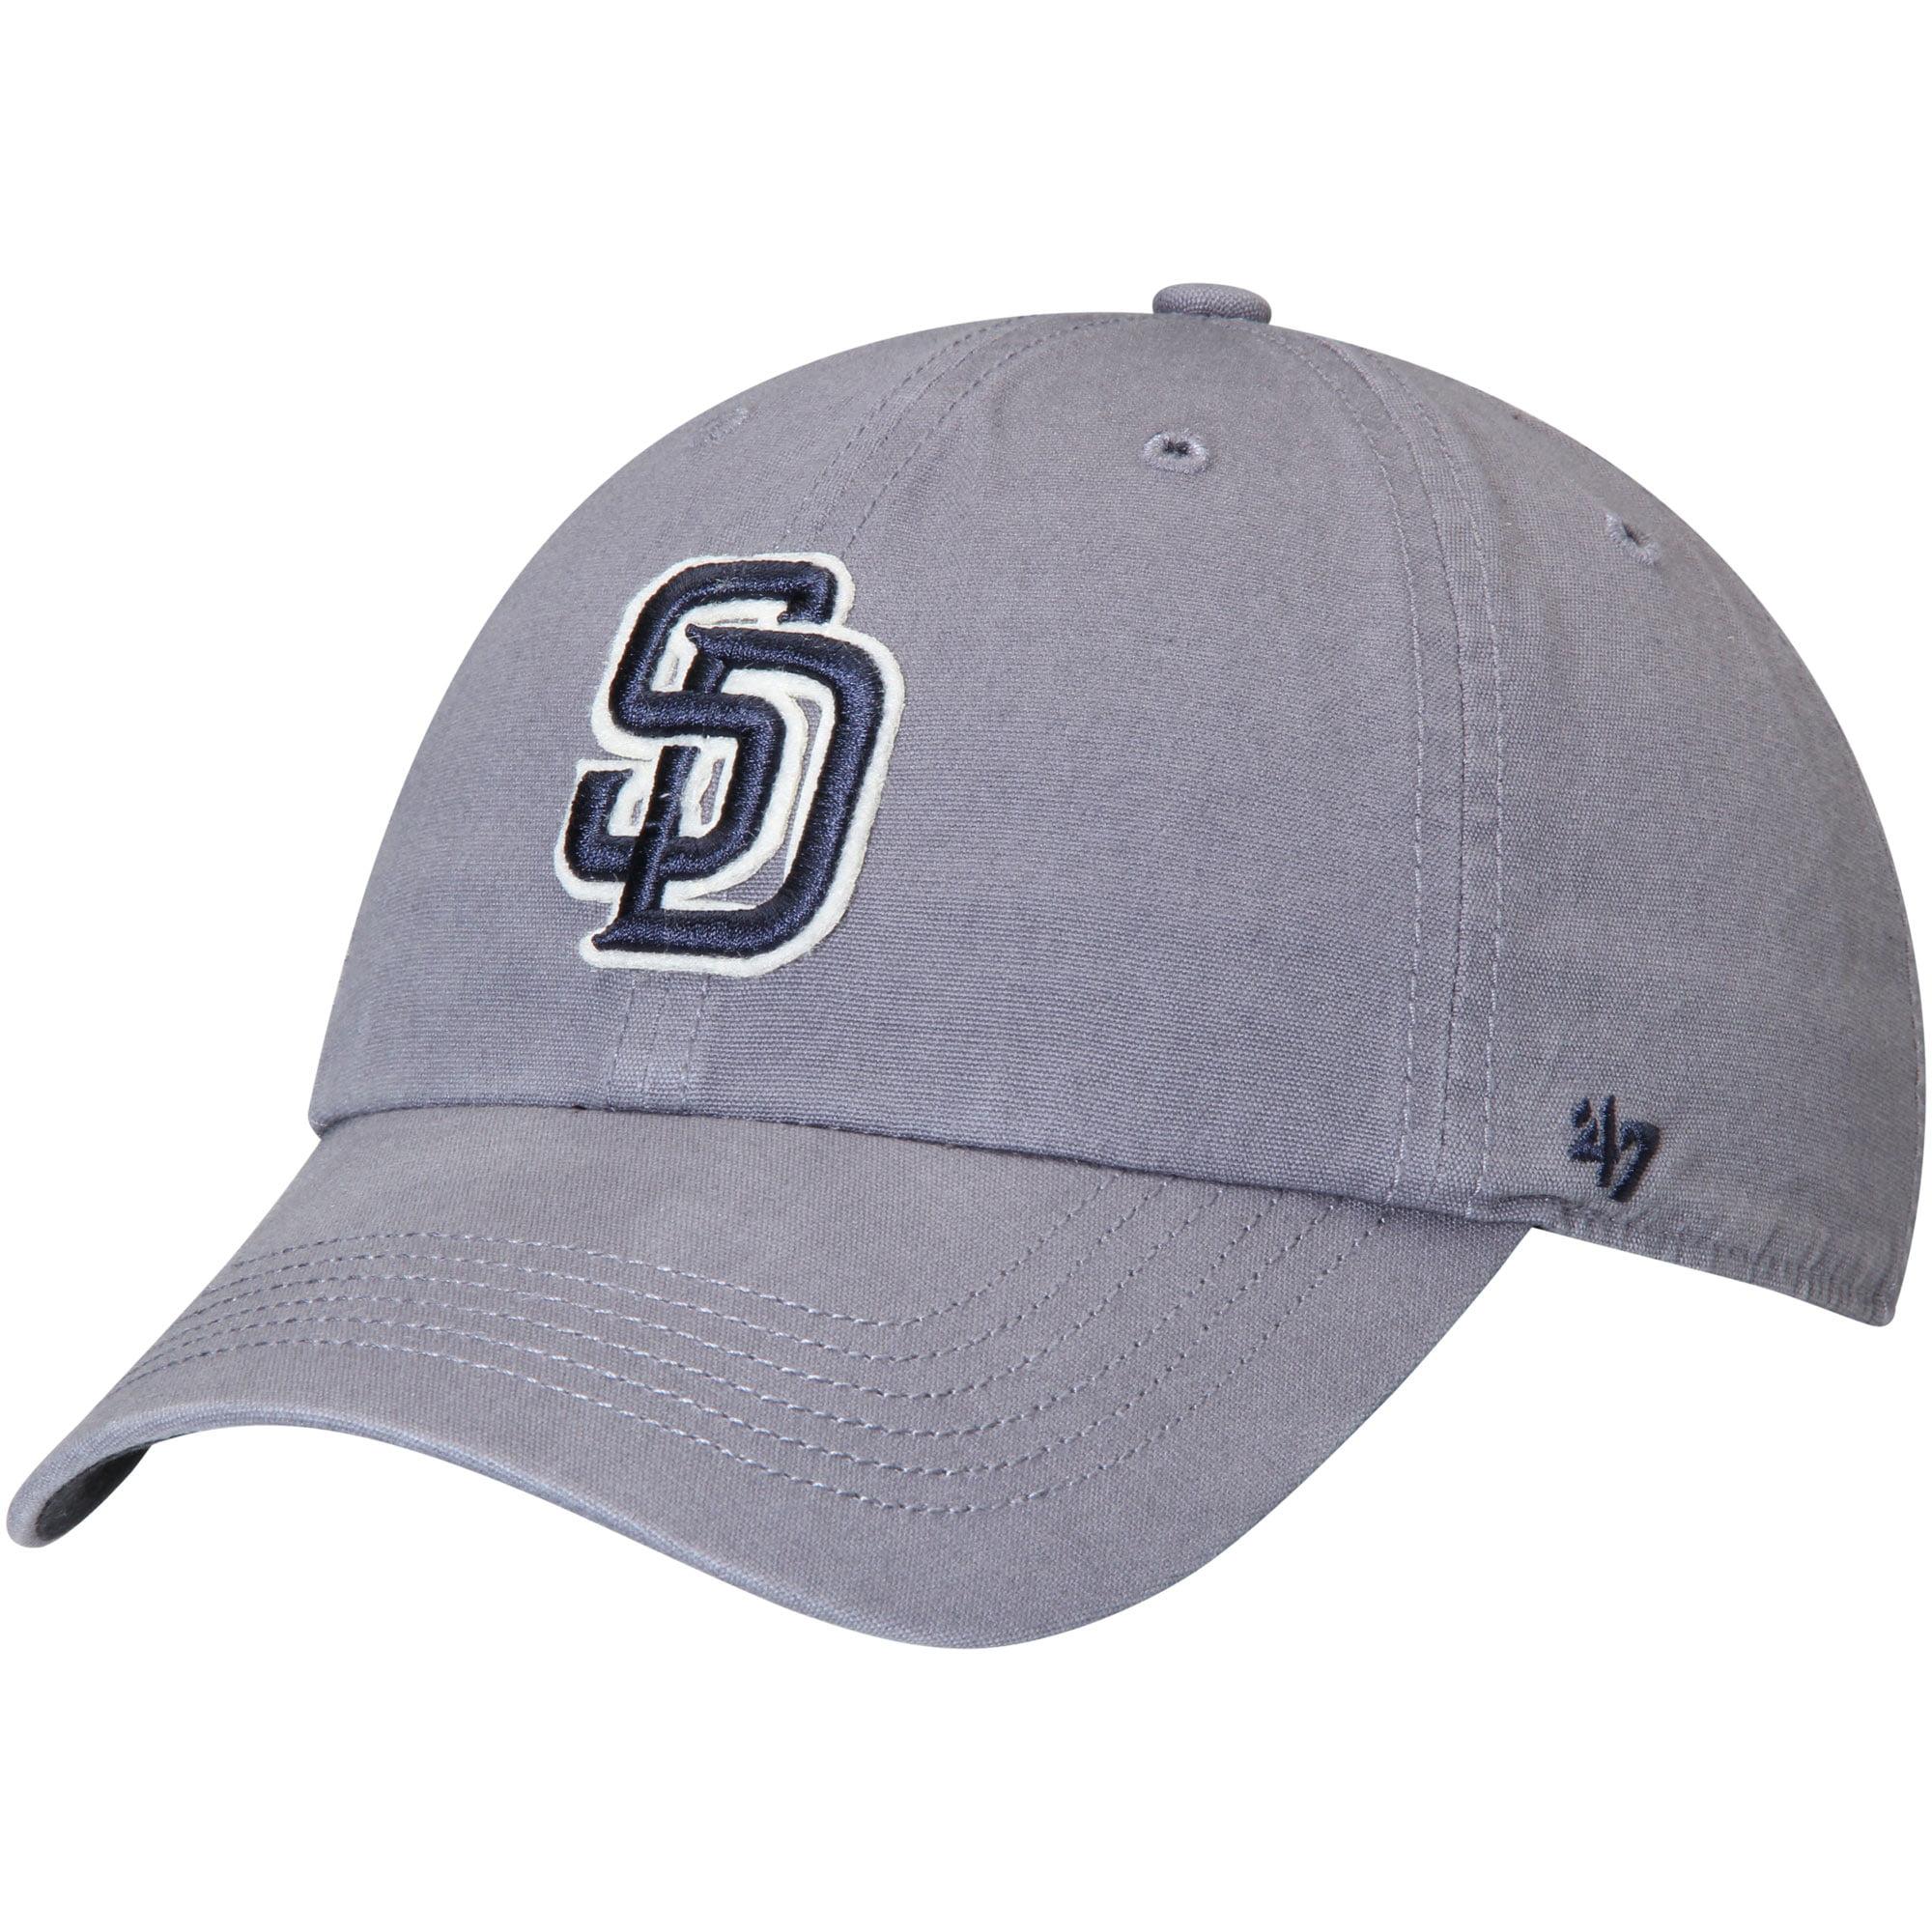 San Diego Padres '47 Borderland Clean Up Adjustable Hat - Navy - OSFA